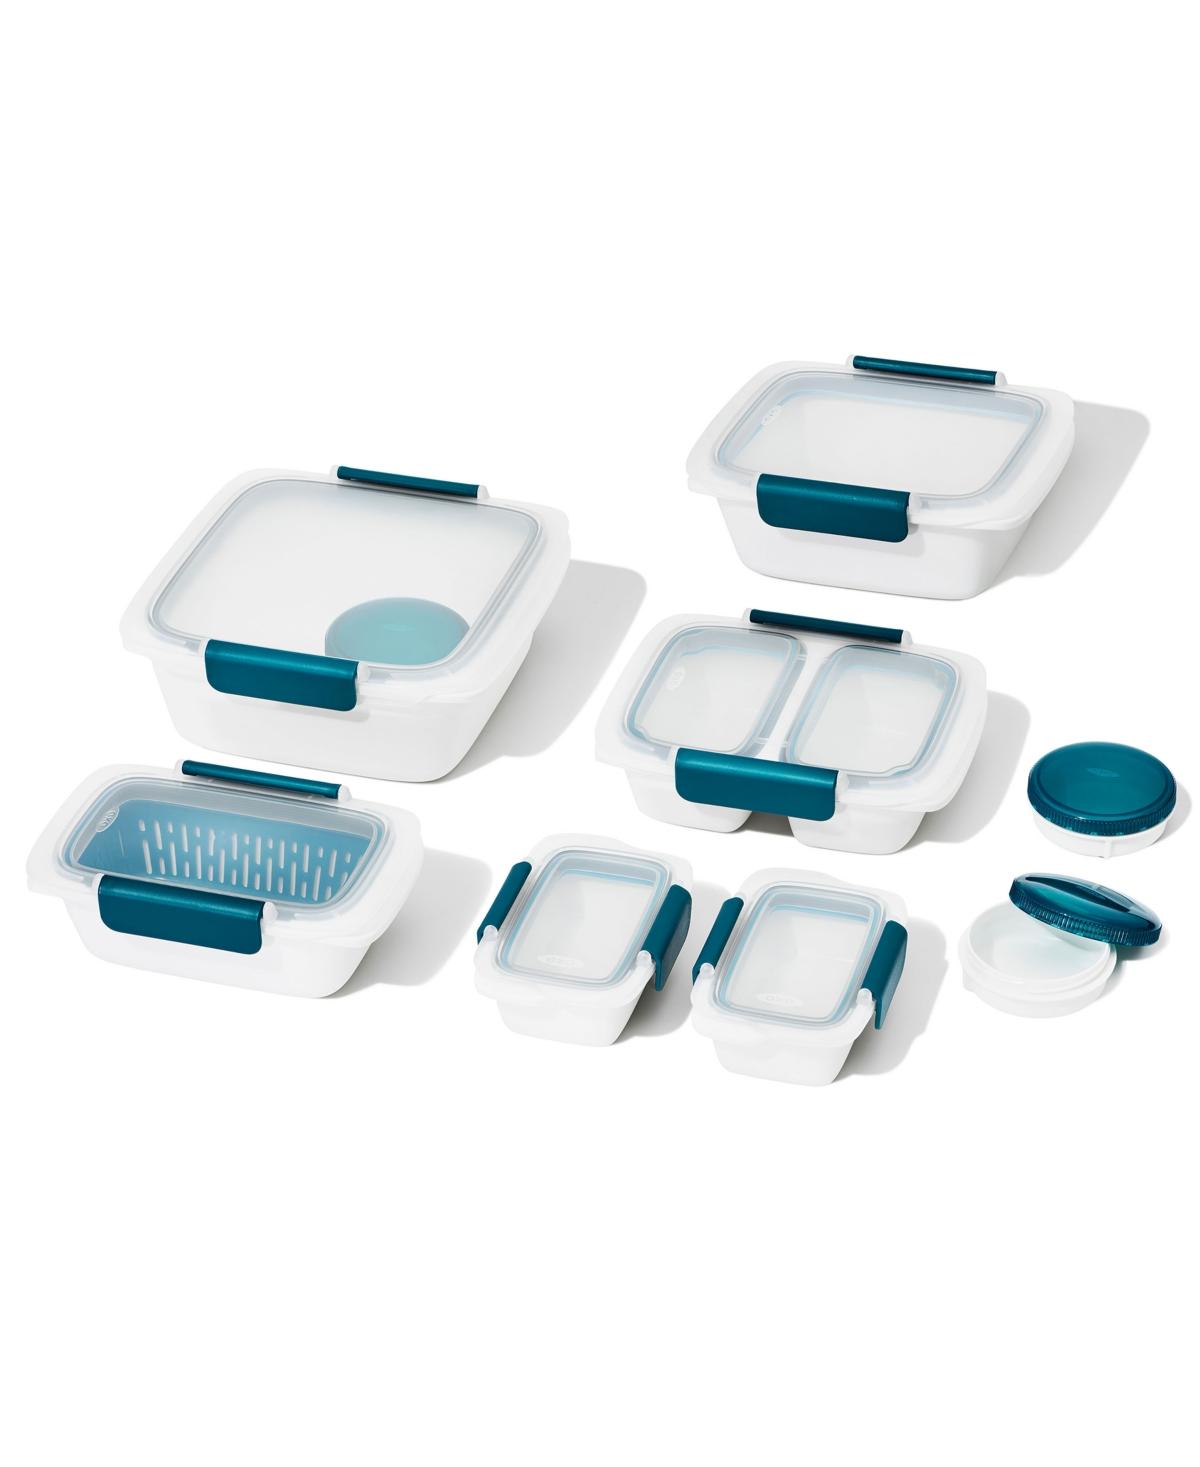 Oxo Prep & Go Food Storage Container 20-Pc. Set